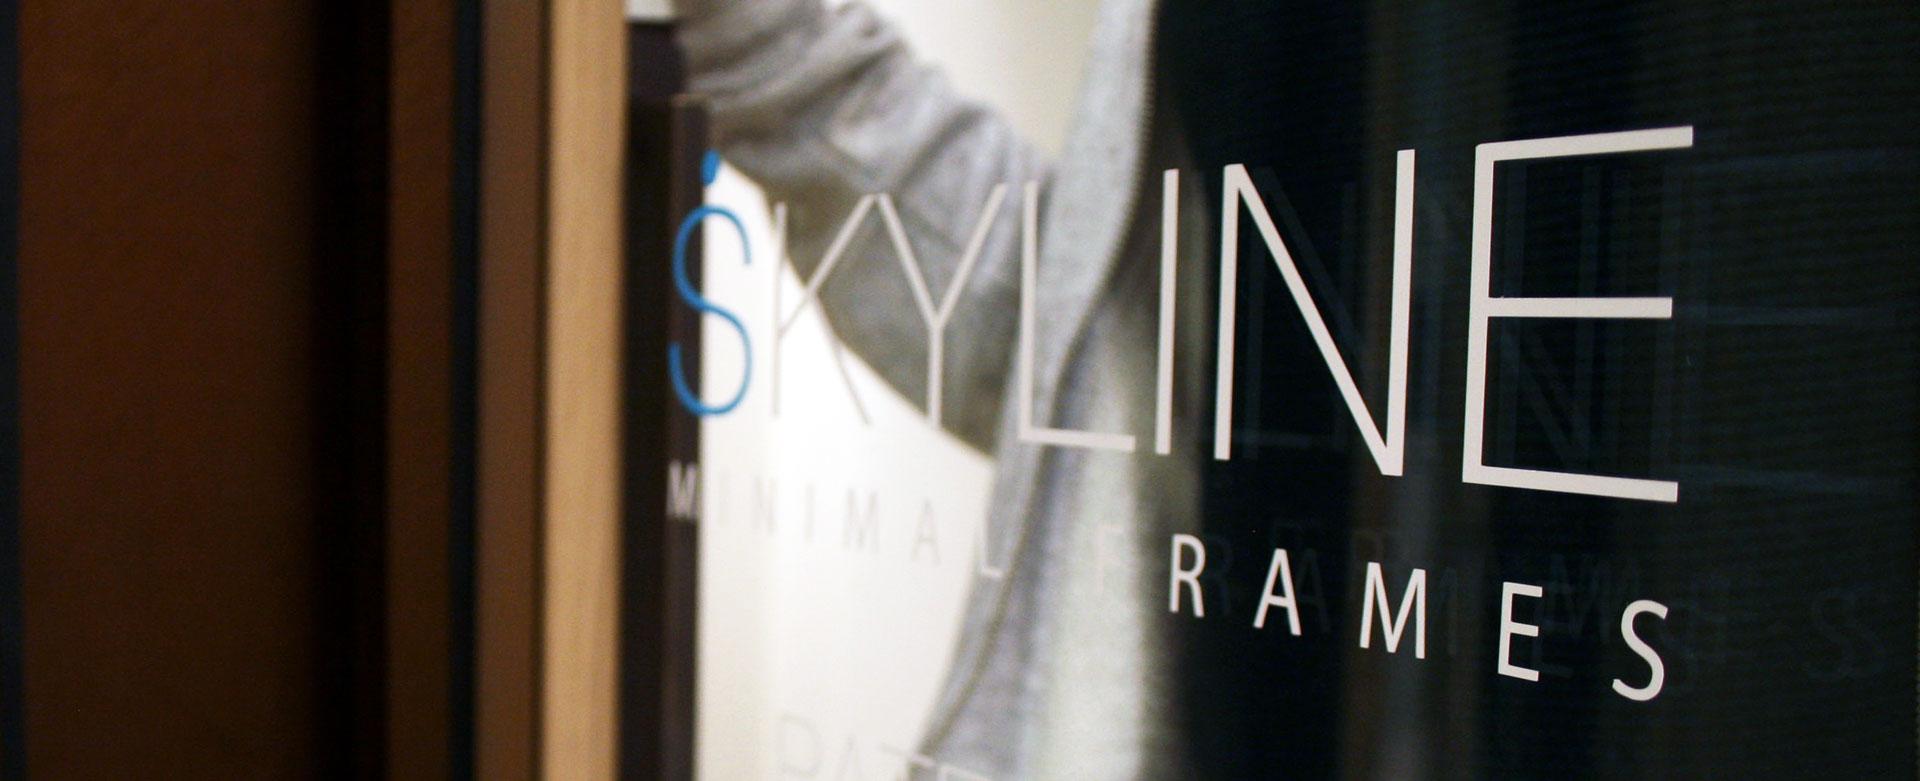 Skyline Handle, immagine di copertina